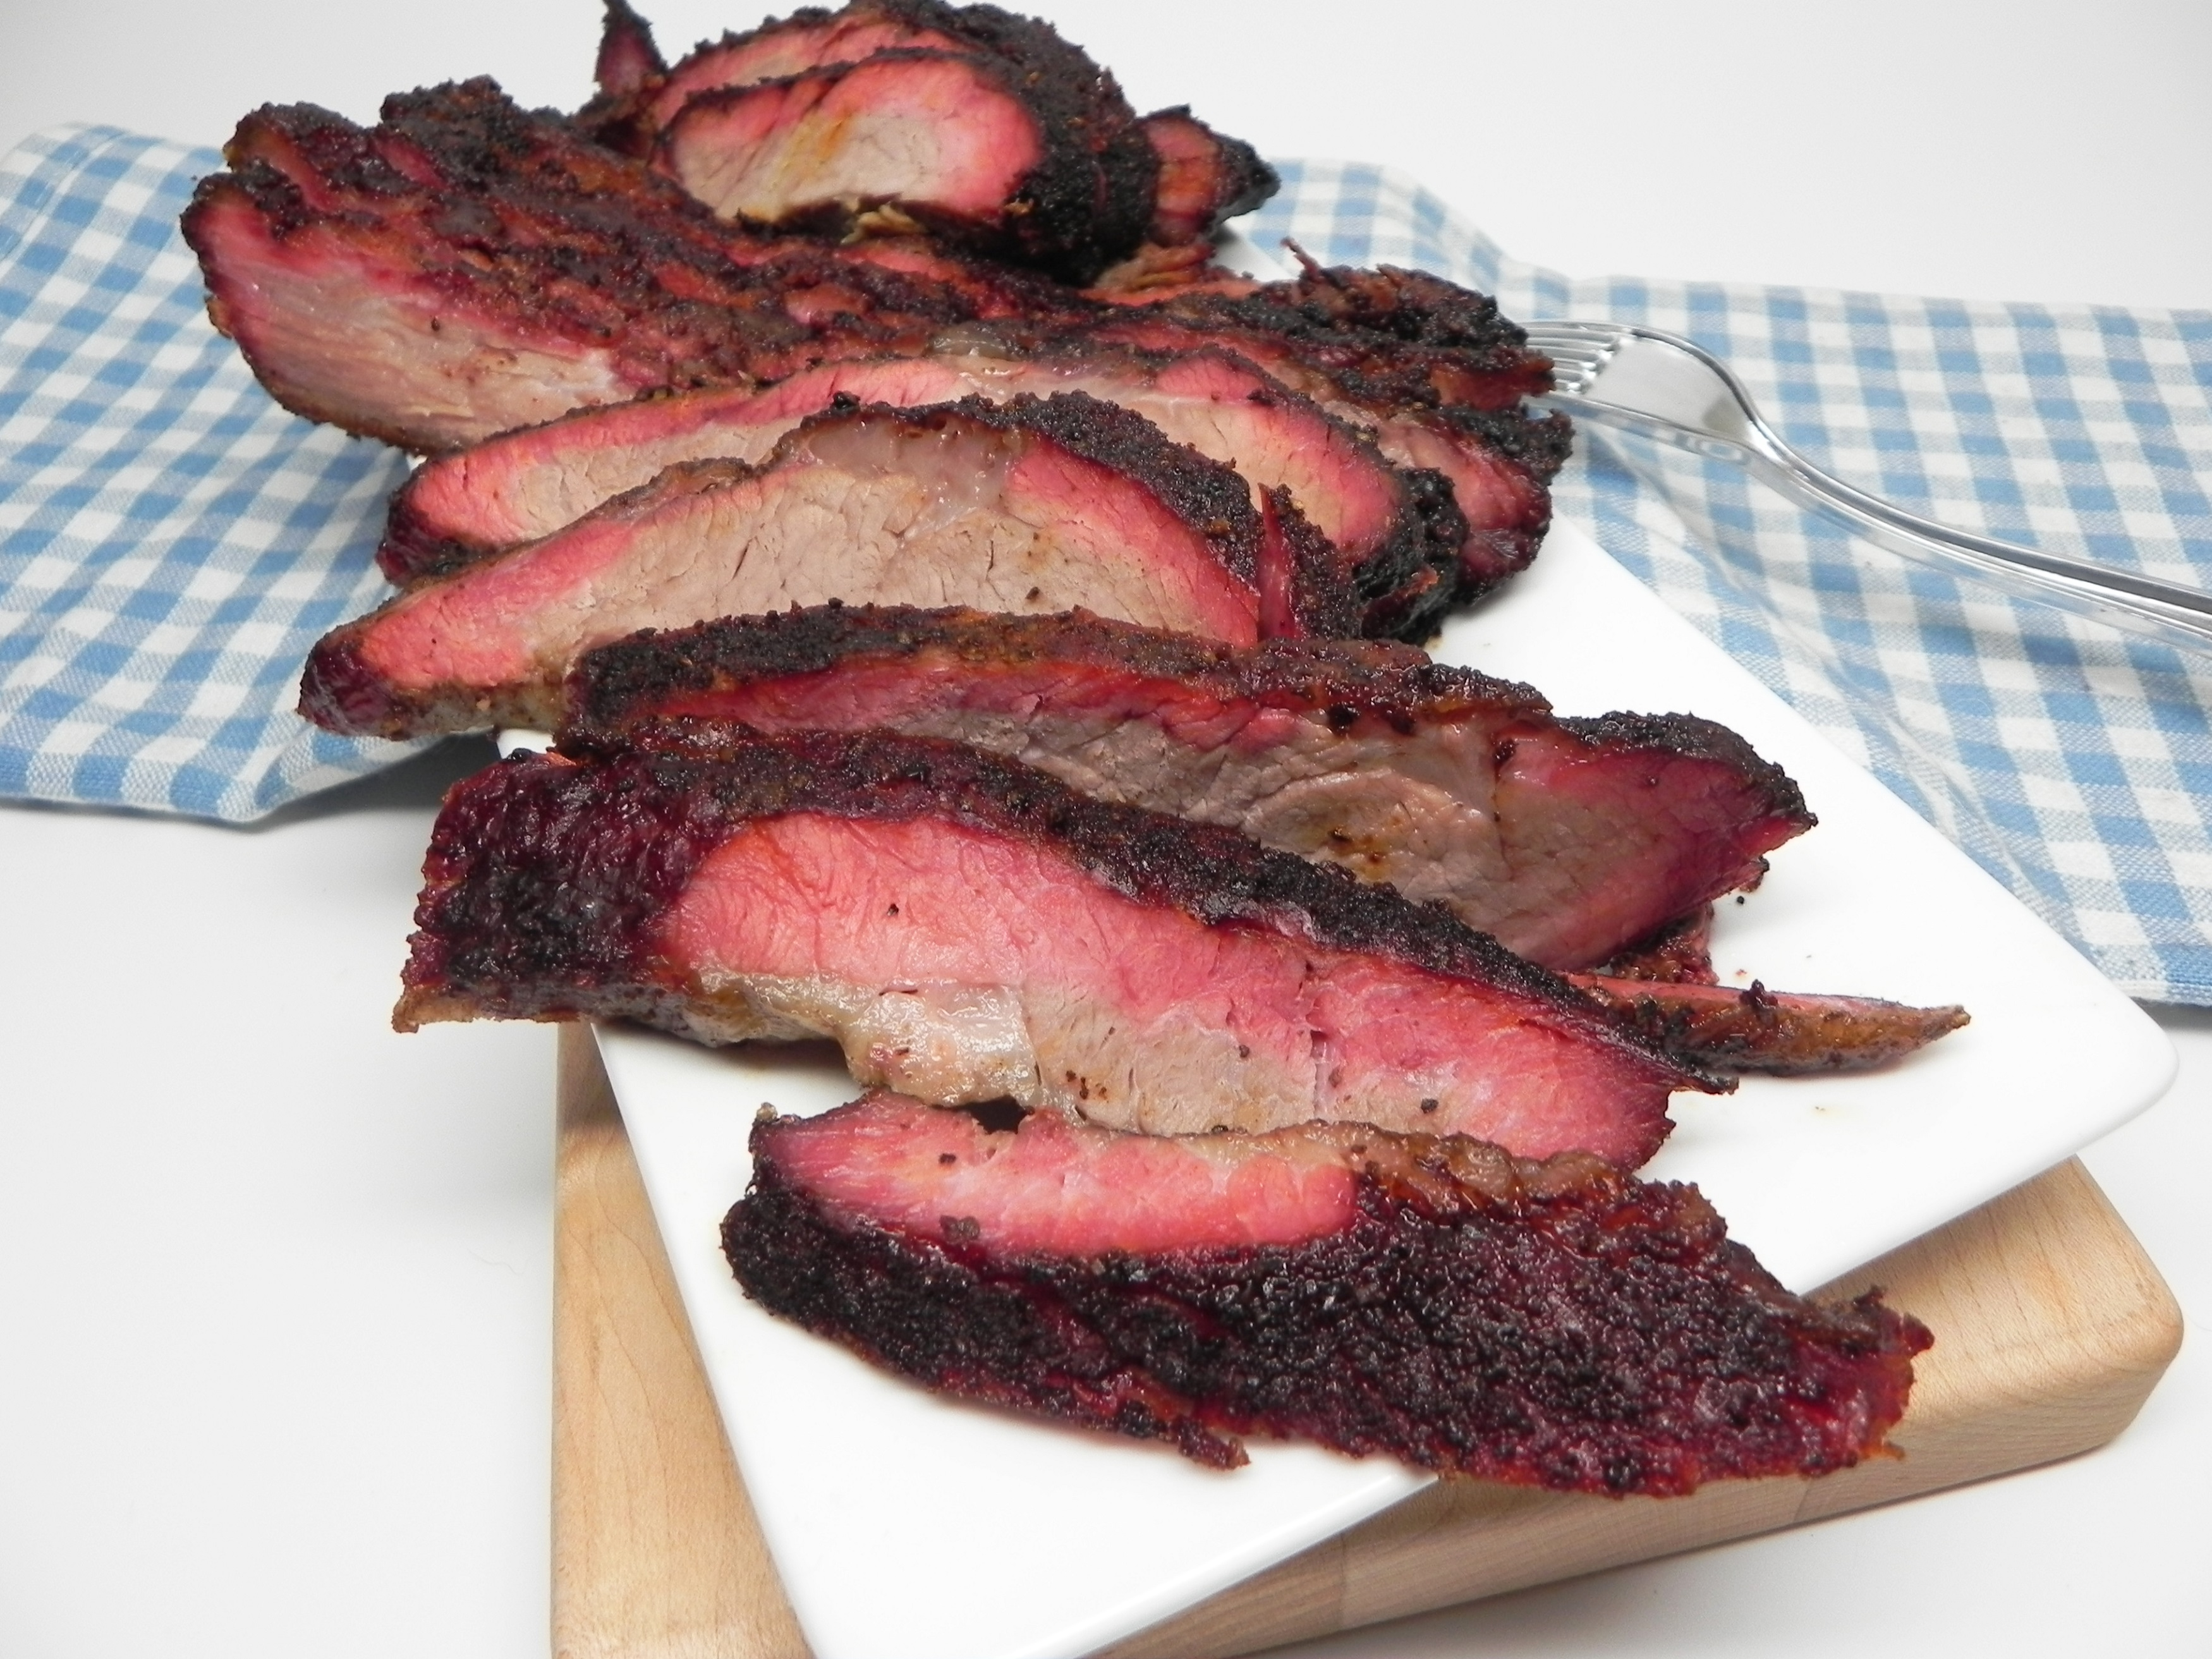 Best BBQ Rub in Texas